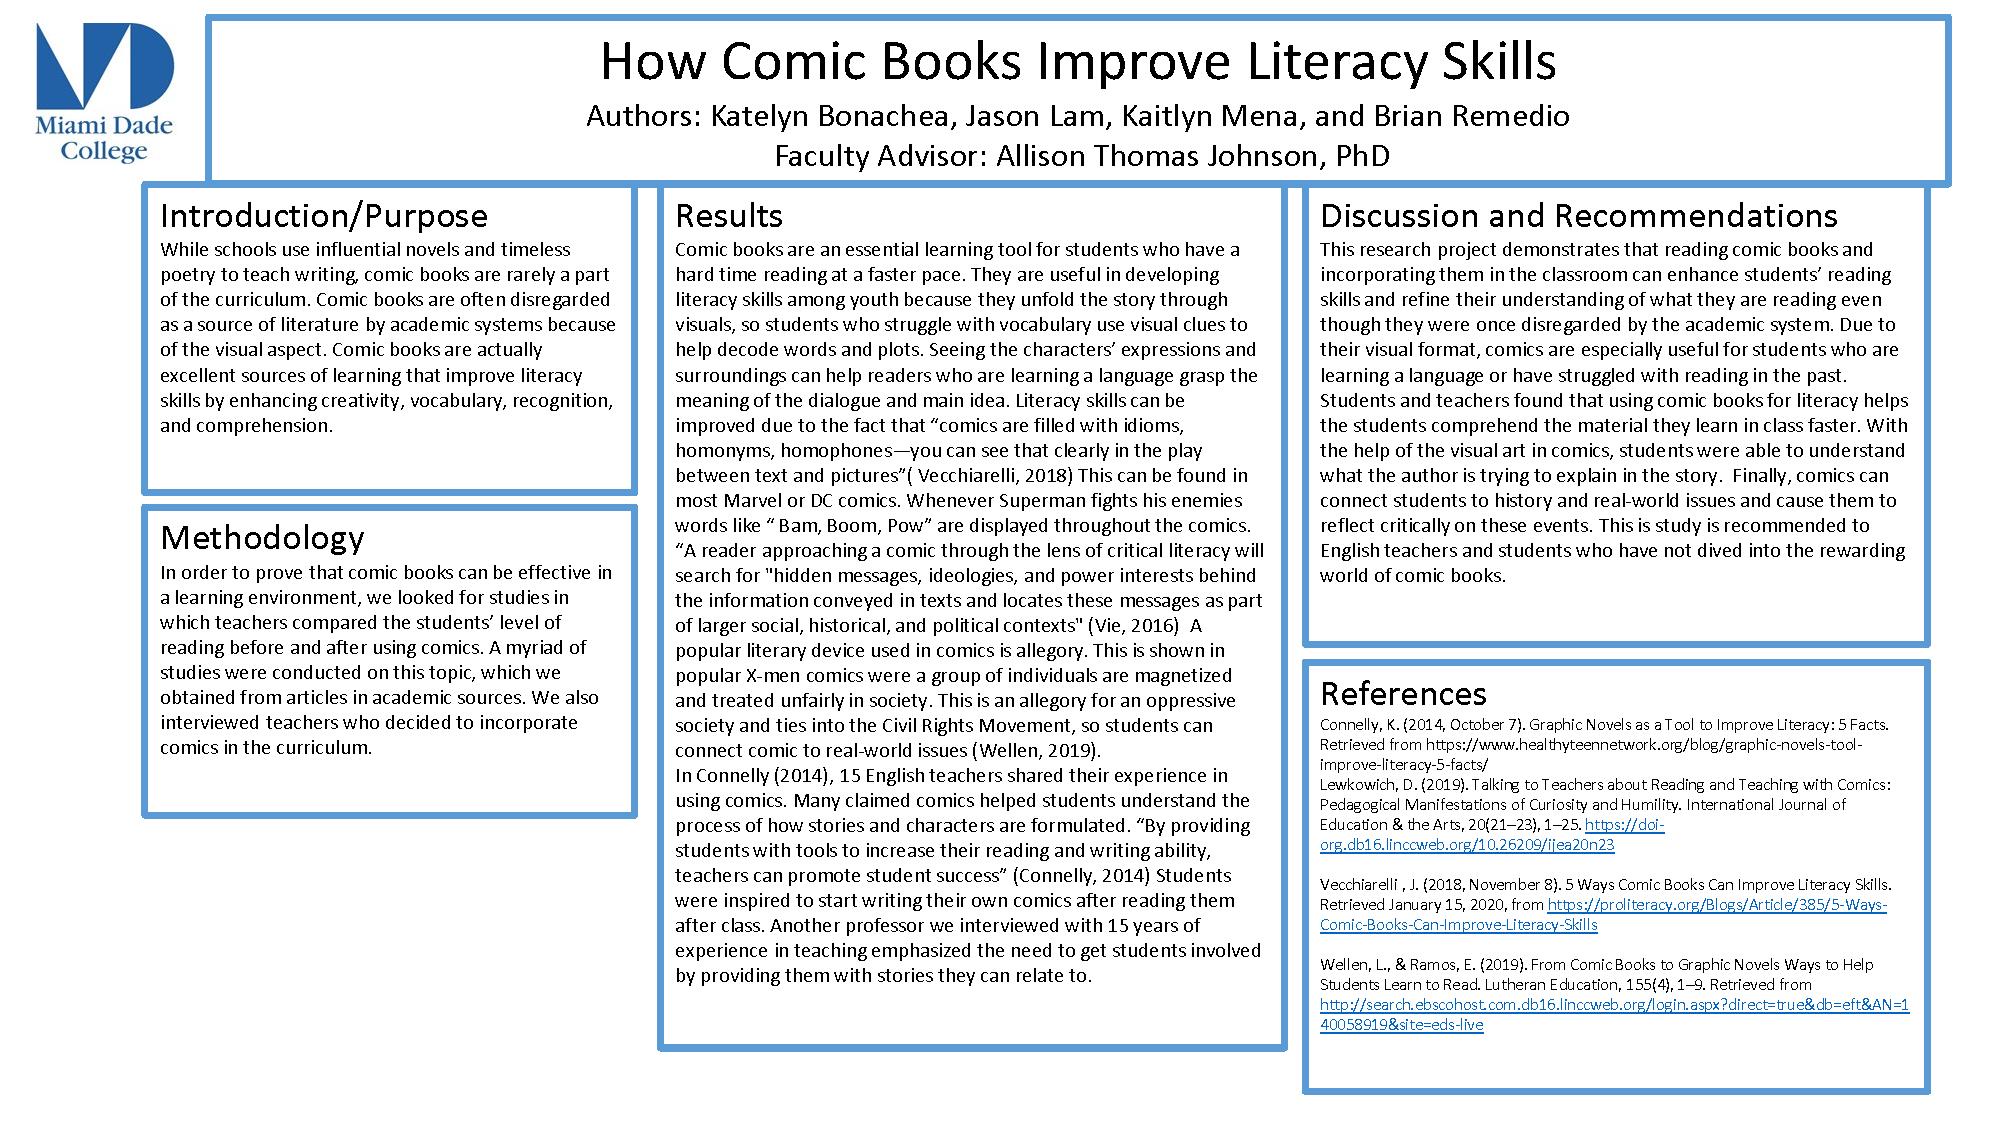 How Comic Books Improve Literacy Skills